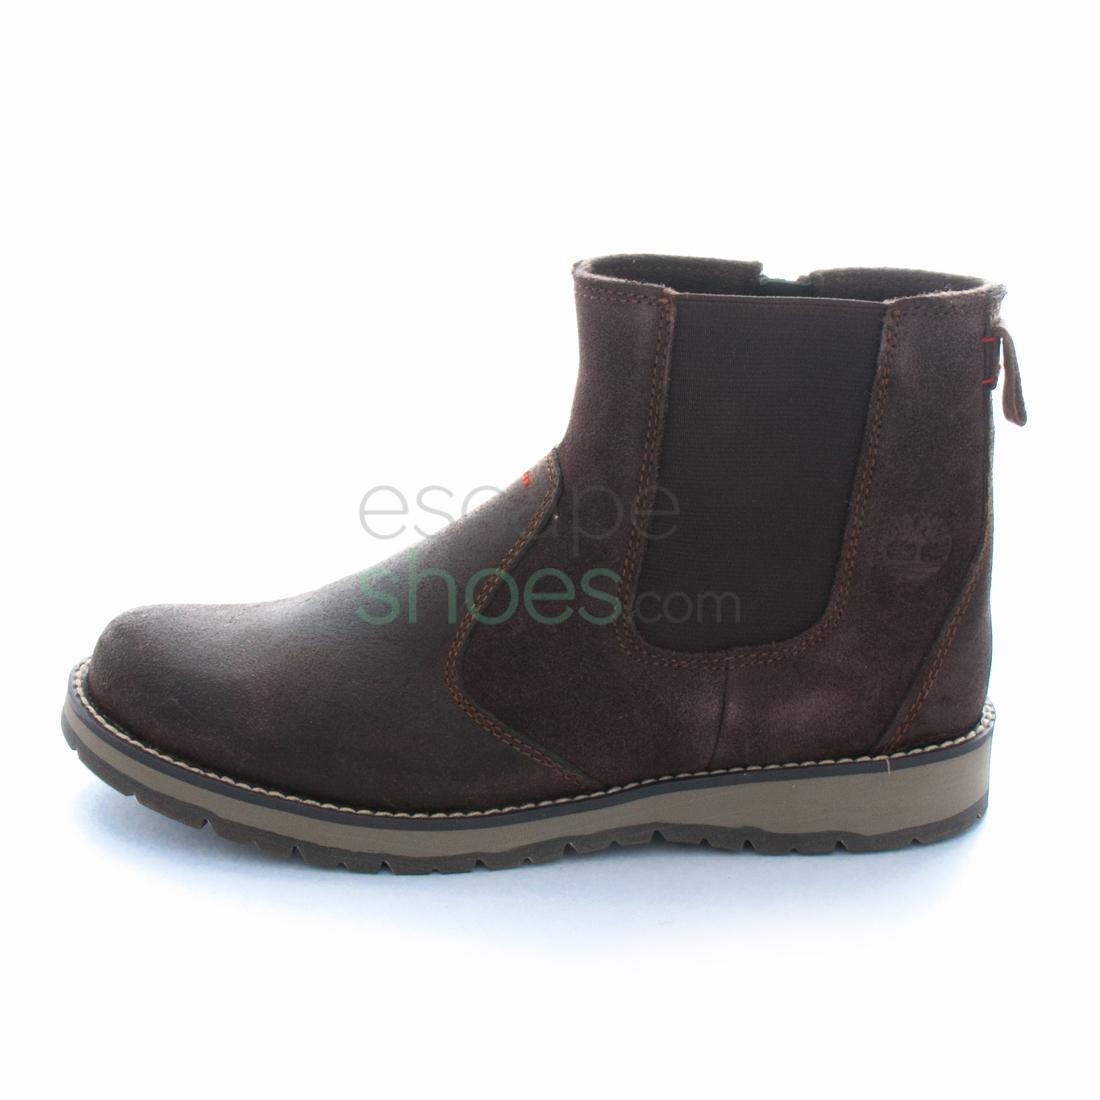 sponsor Civile Risveglio  Boots TIMBERLAND Kidder Hill Wedge Chelsea Potting Soil A1C92